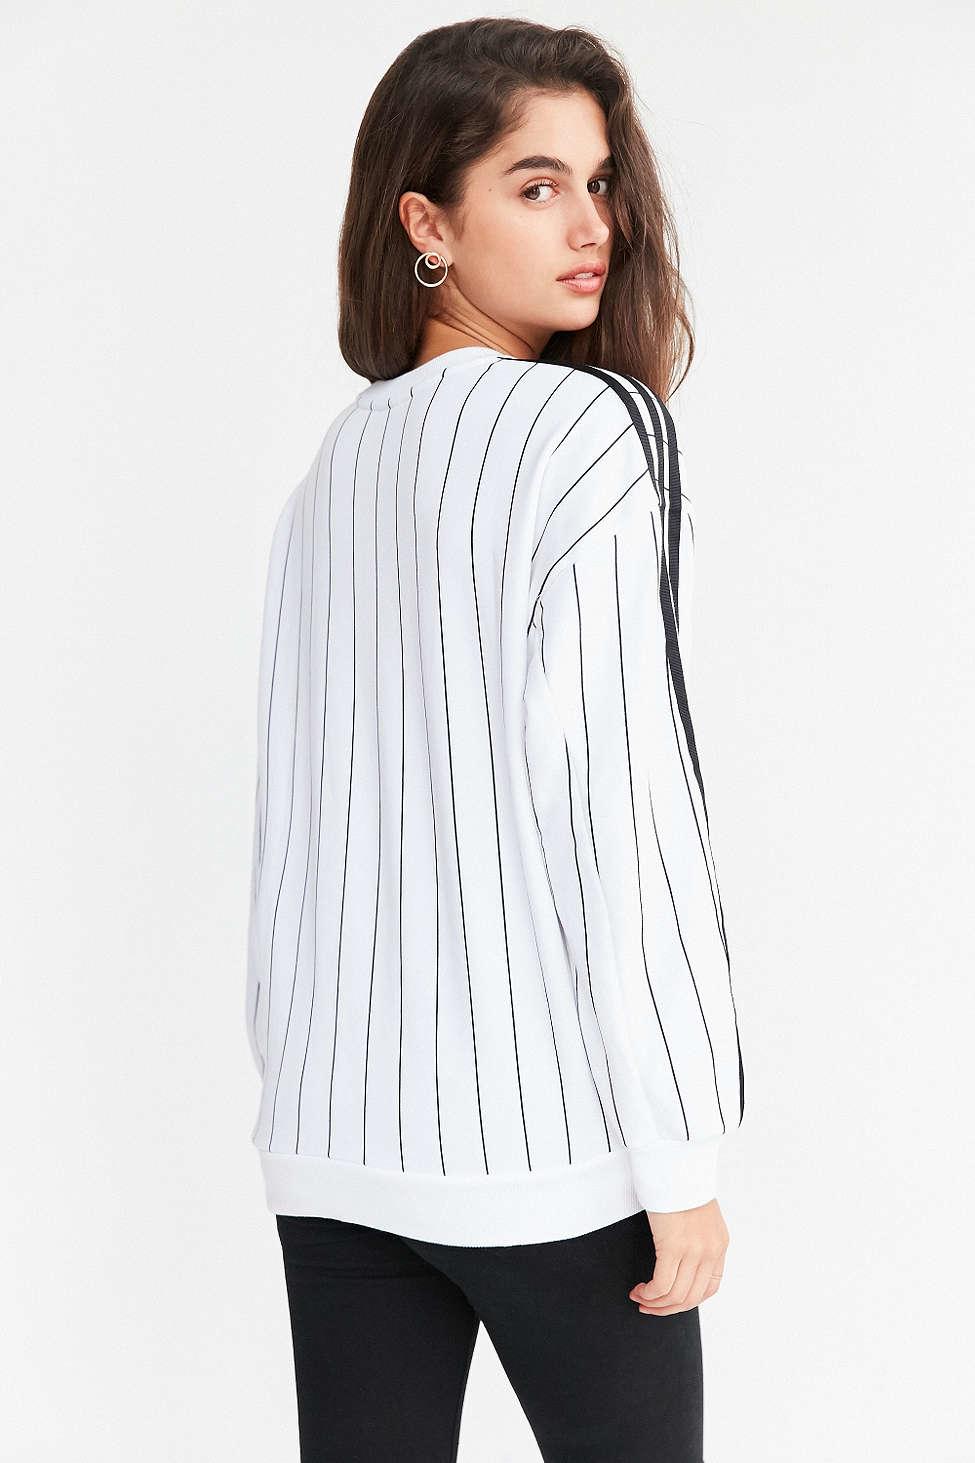 adidas originals originals sos tennis pullover sweatshirt. Black Bedroom Furniture Sets. Home Design Ideas